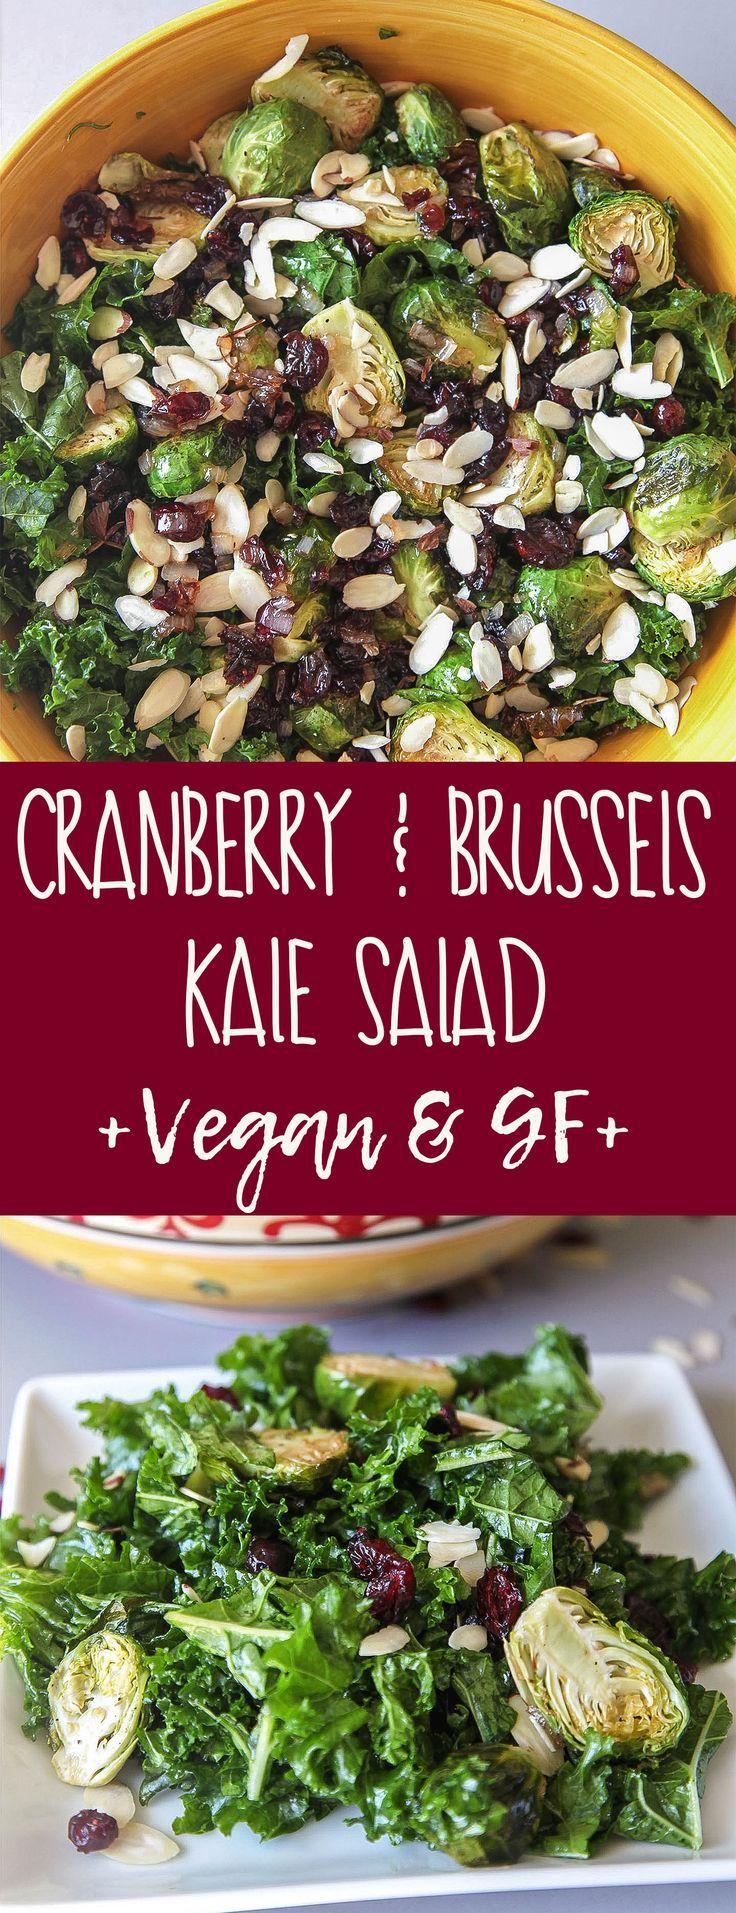 Cranberry & Brussels Kale Salad   Posted By: DebbieNet.com